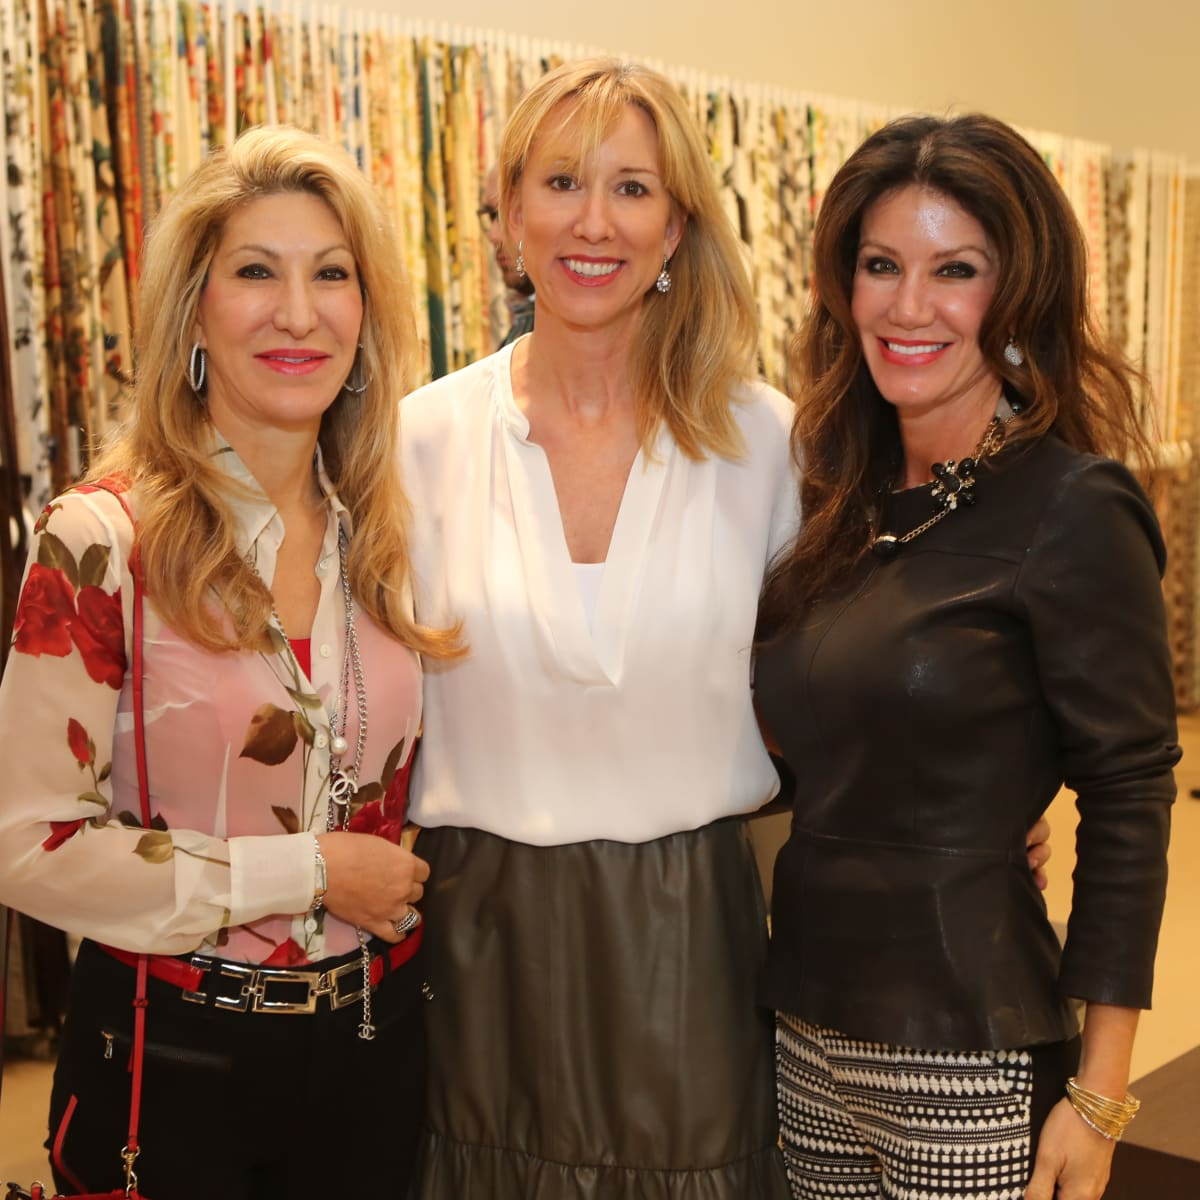 News, Shelby, Decorative Center Houston Fall Market, Nov. 2015, Rosemary Roth, Caroline Finklestein, Paula Fryh